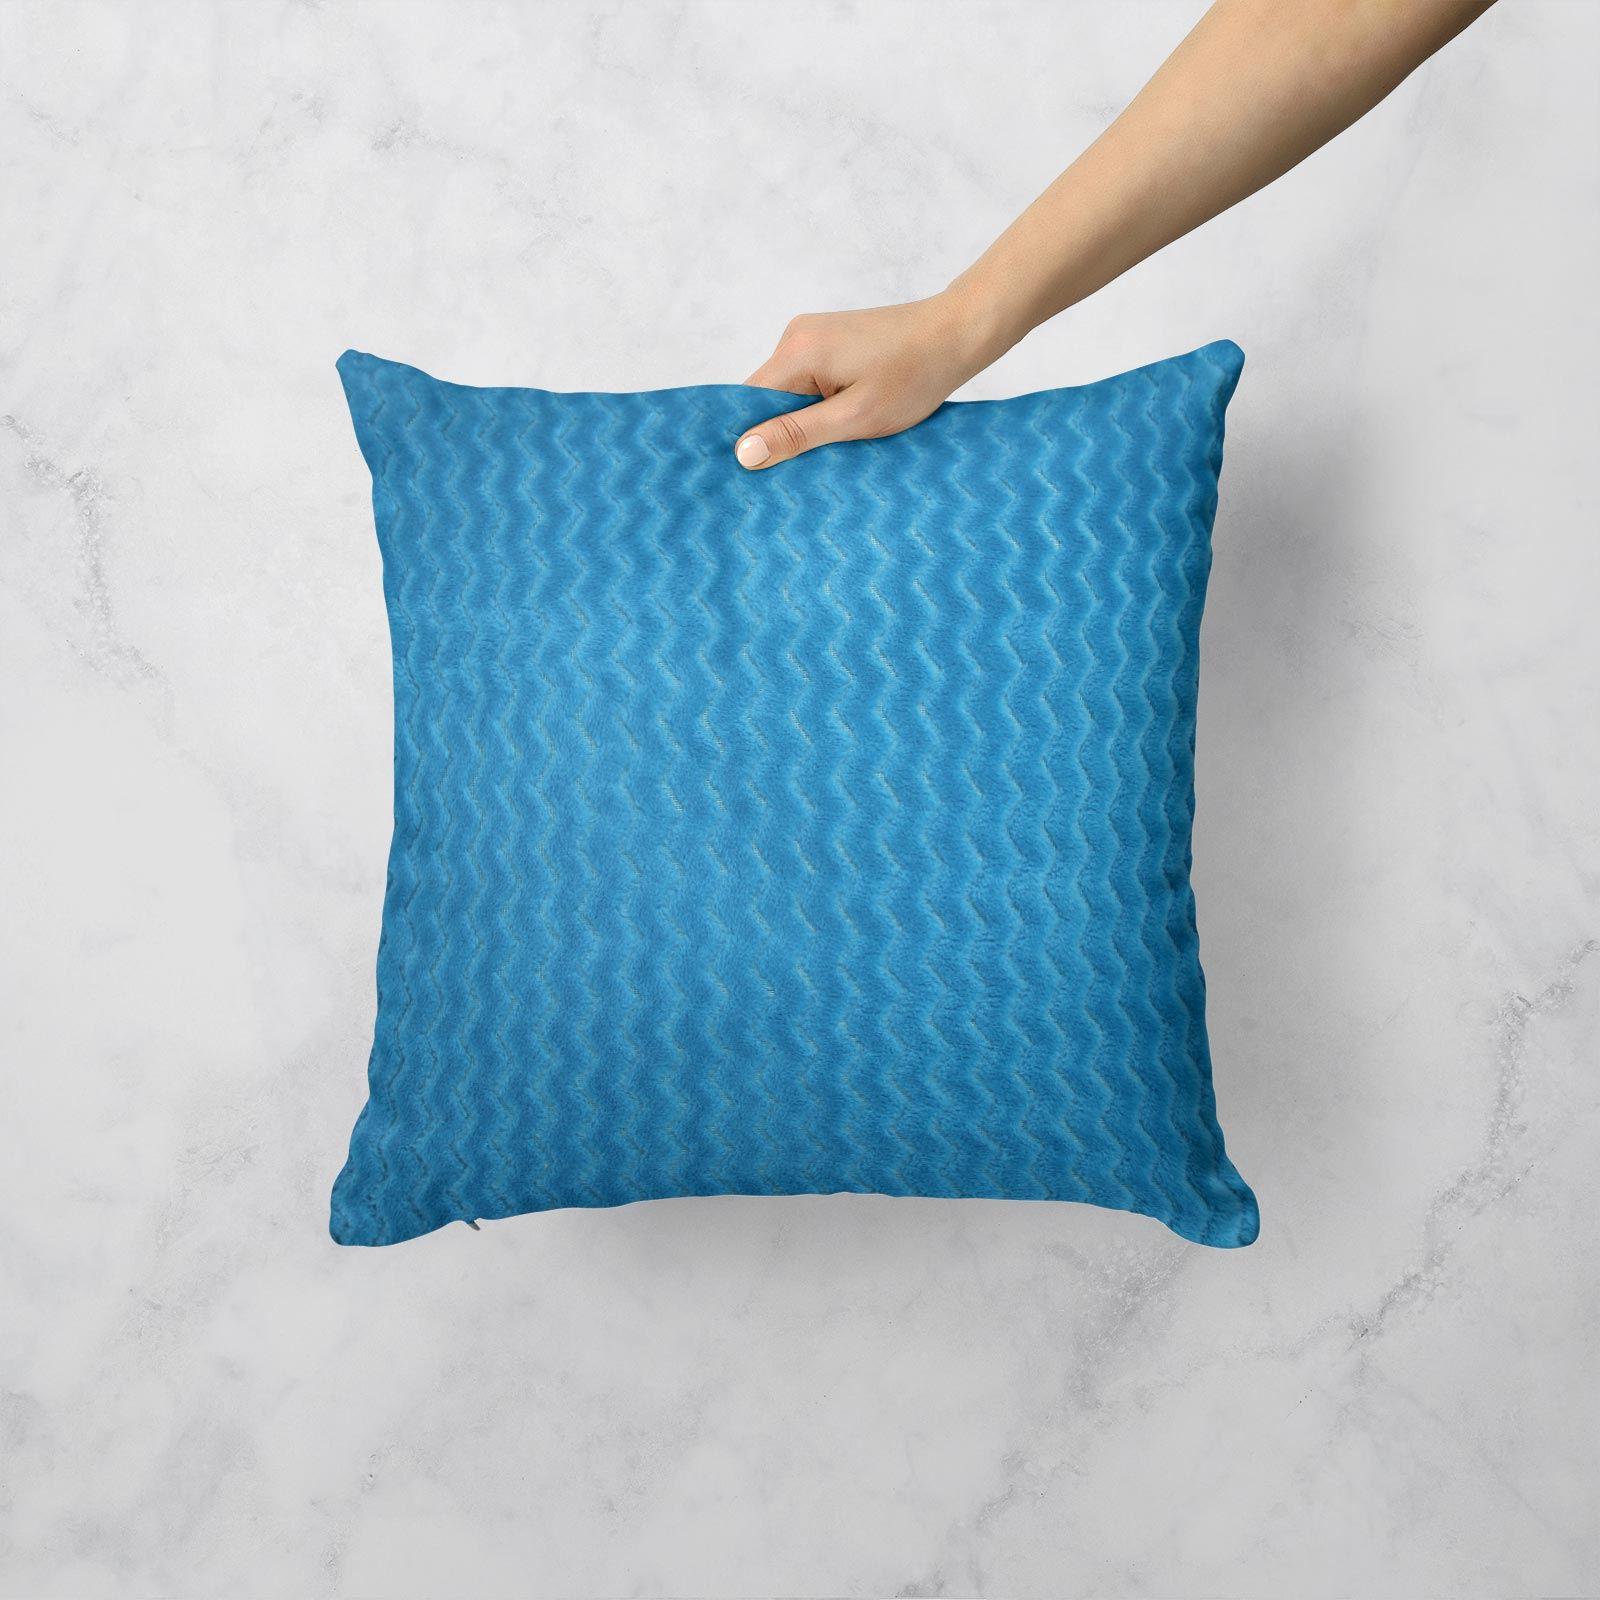 Teal-Blue-Duck-Egg-Cushion-Covers-18-034-x18-034-45cm-x-45cm-Luxury-Cover thumbnail 36